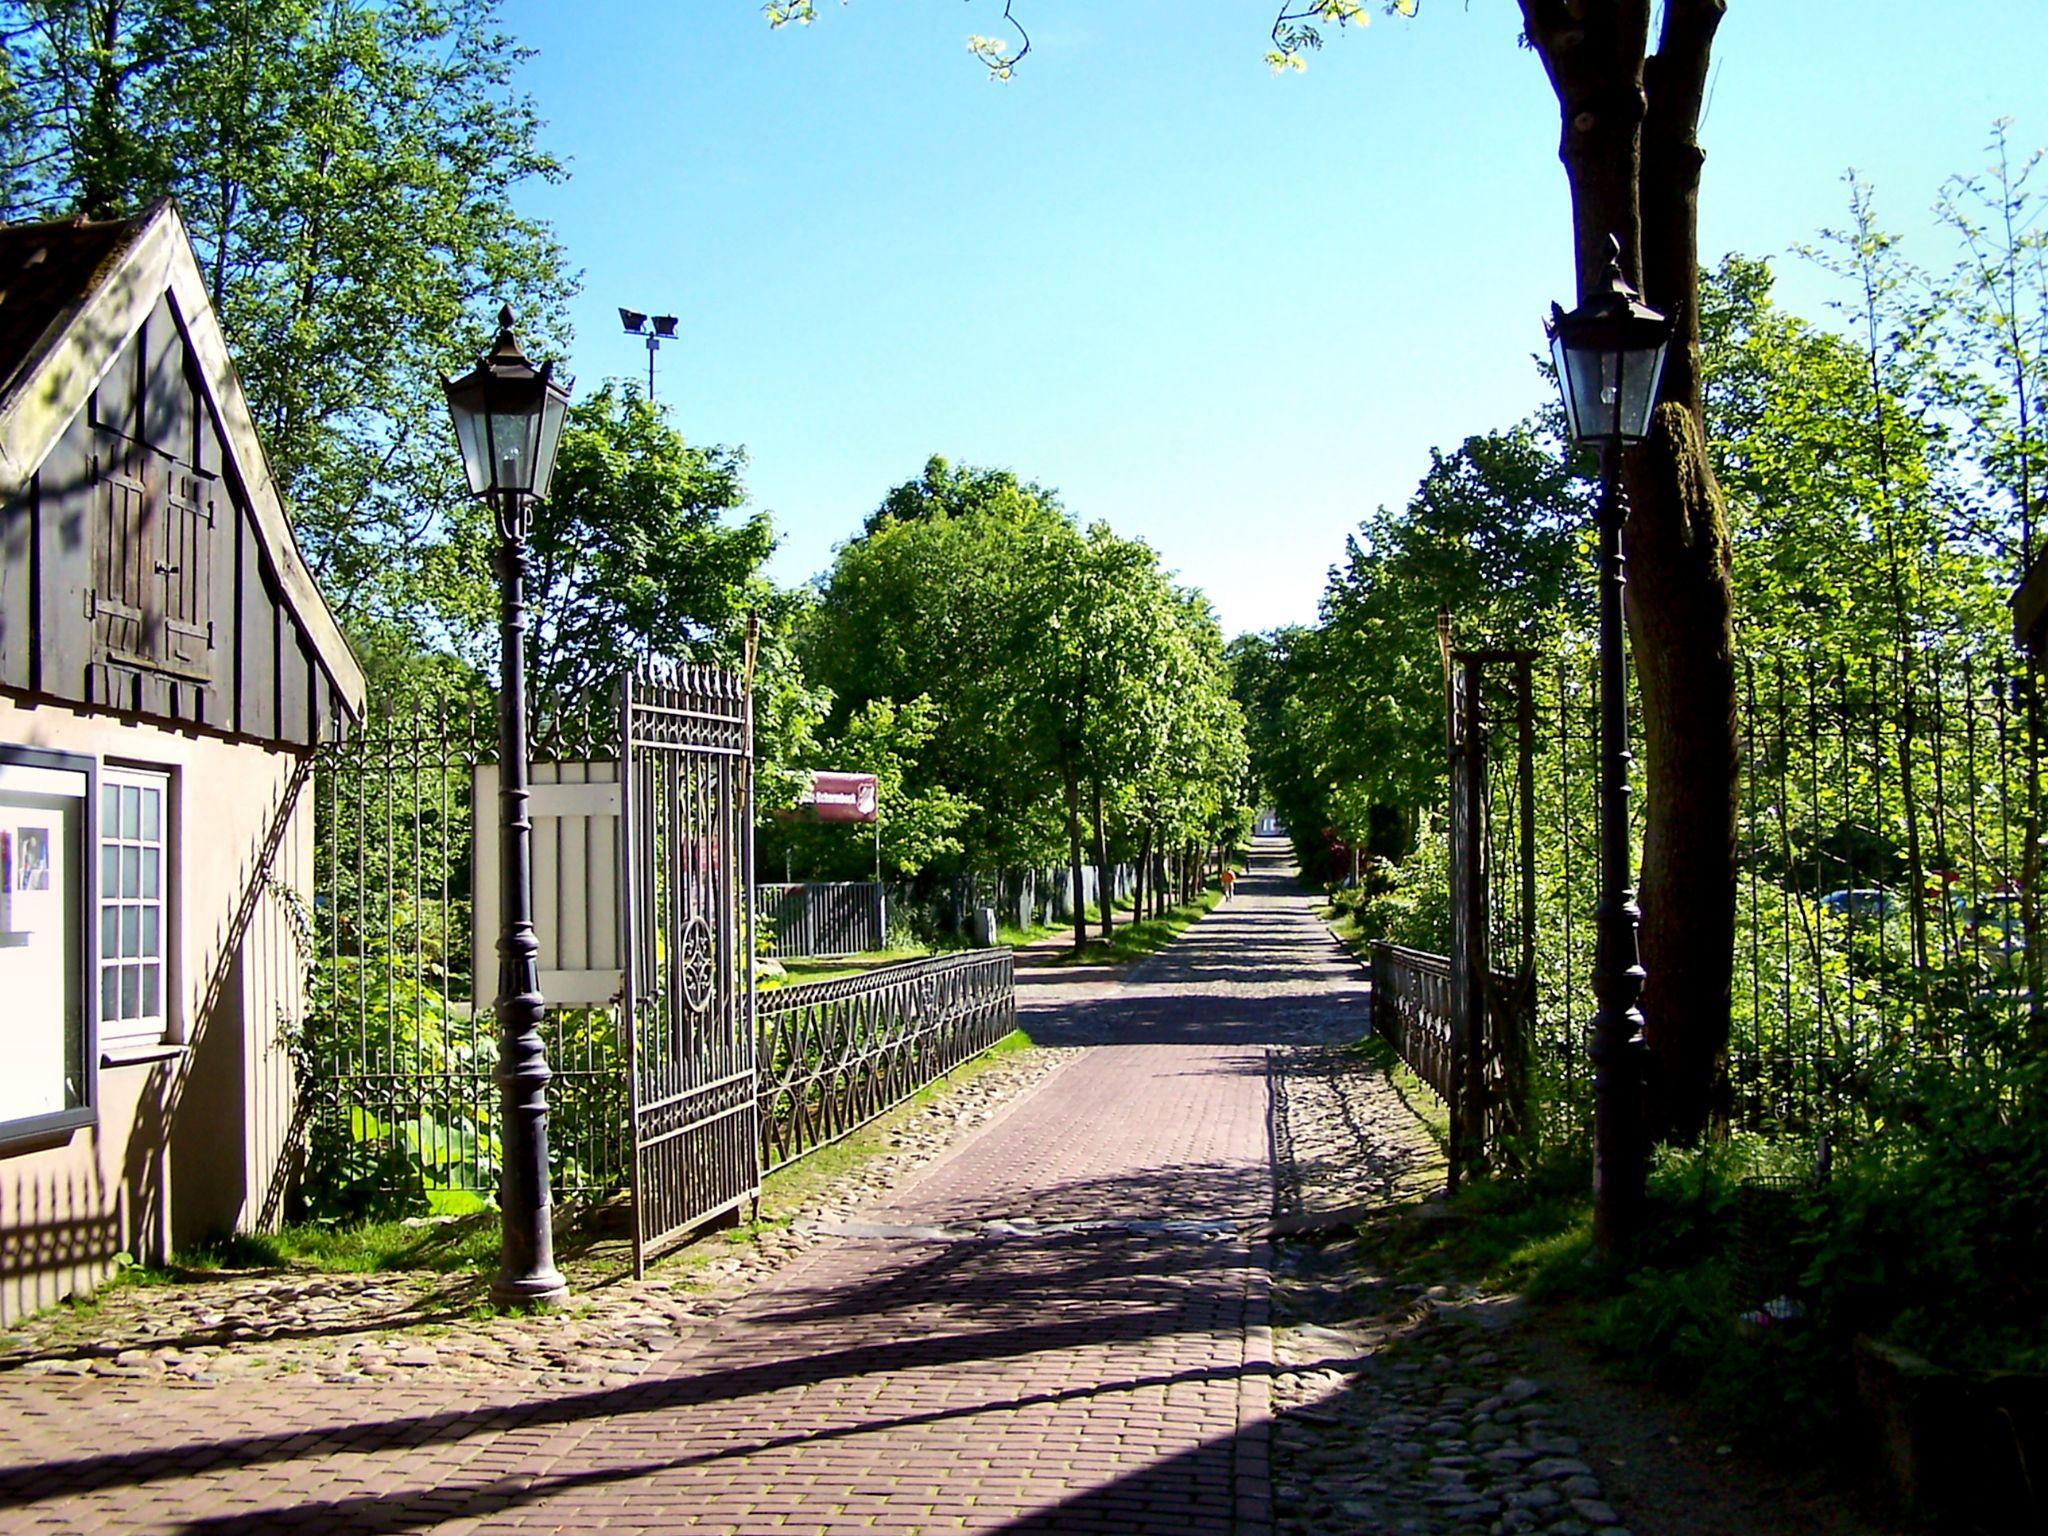 The Gate by reinhard.tenzler